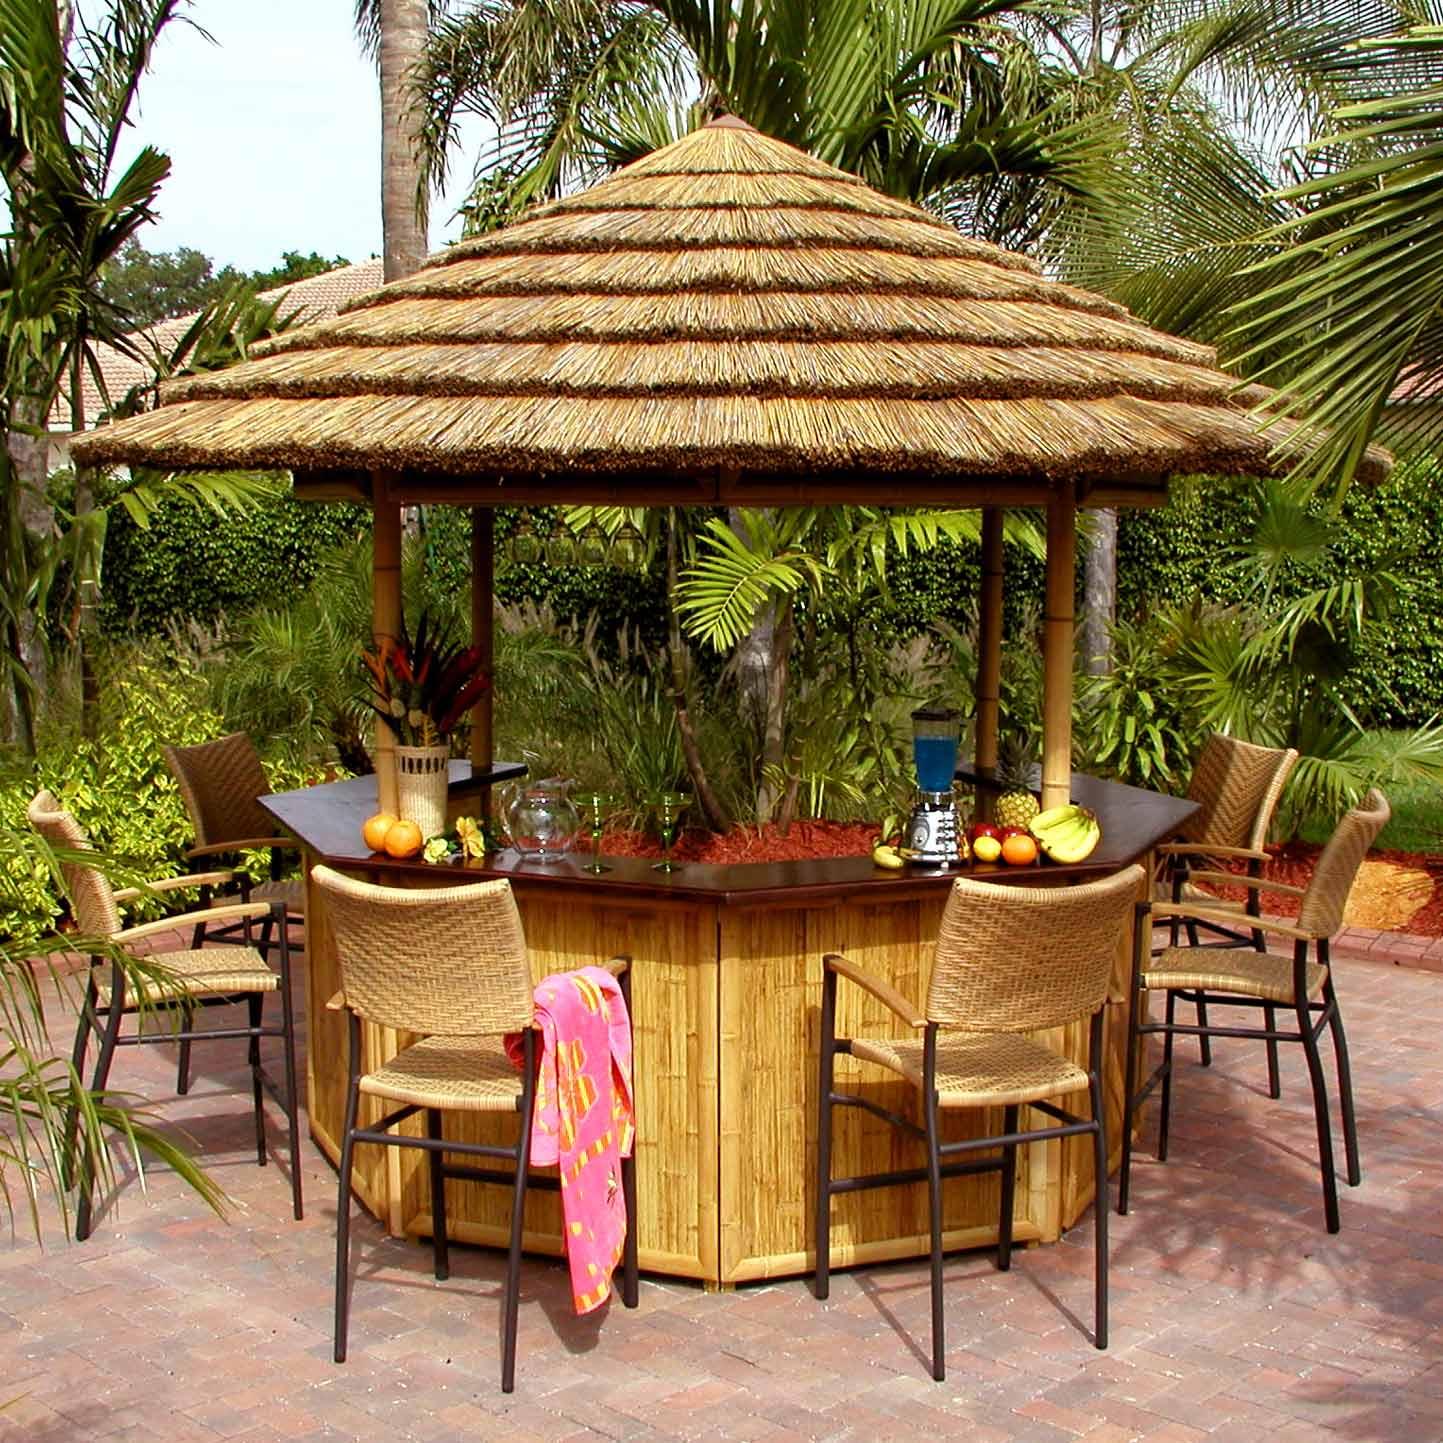 bamboo tiki bar thatch roofing